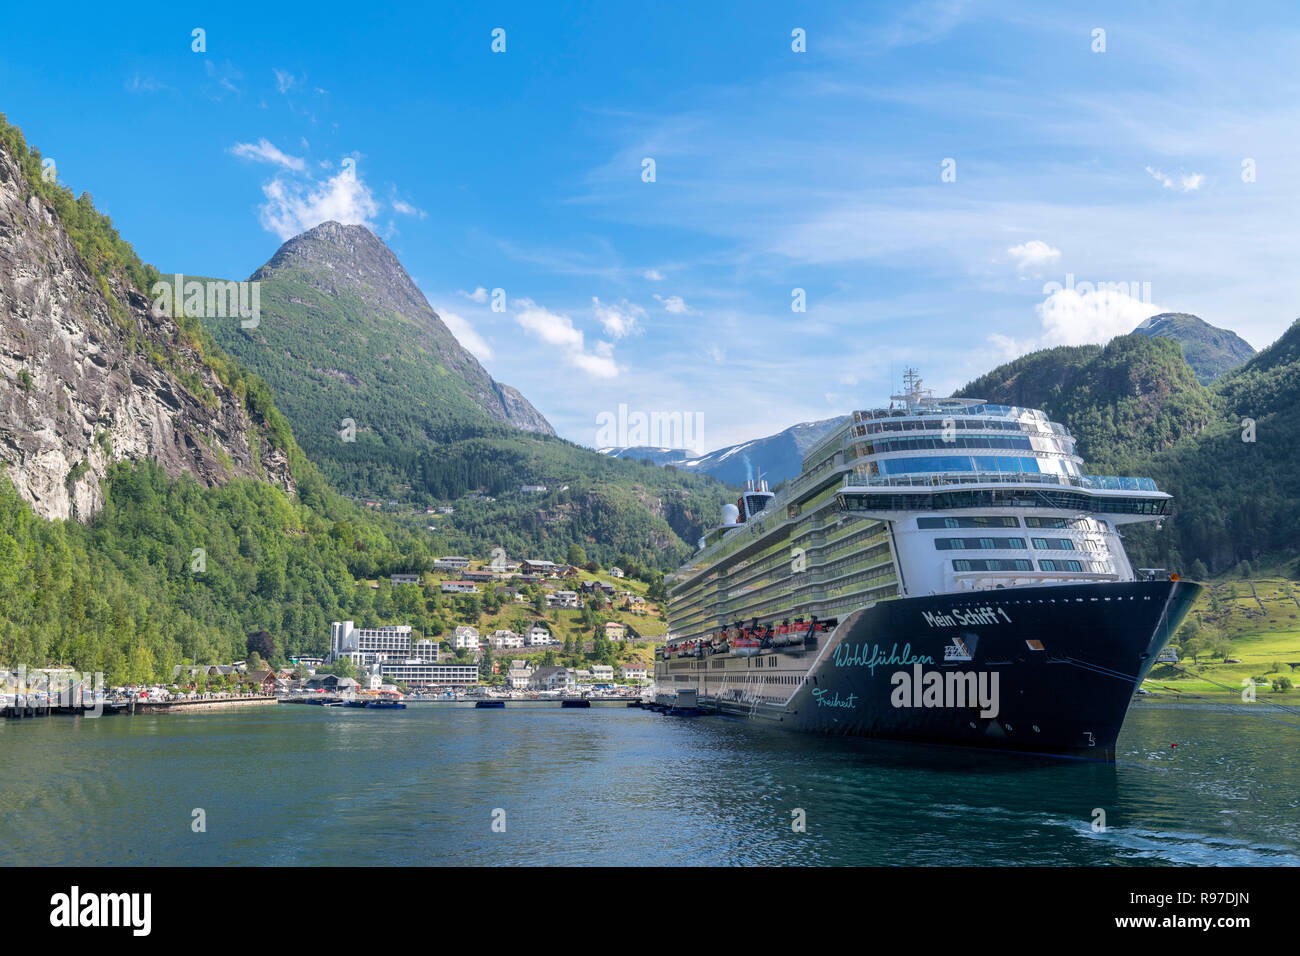 Tui Mein Schiff 1 cruise ship in the harbour at Geiranger, Møre og Romsdal, Sunnmøre, Norway - Stock Image